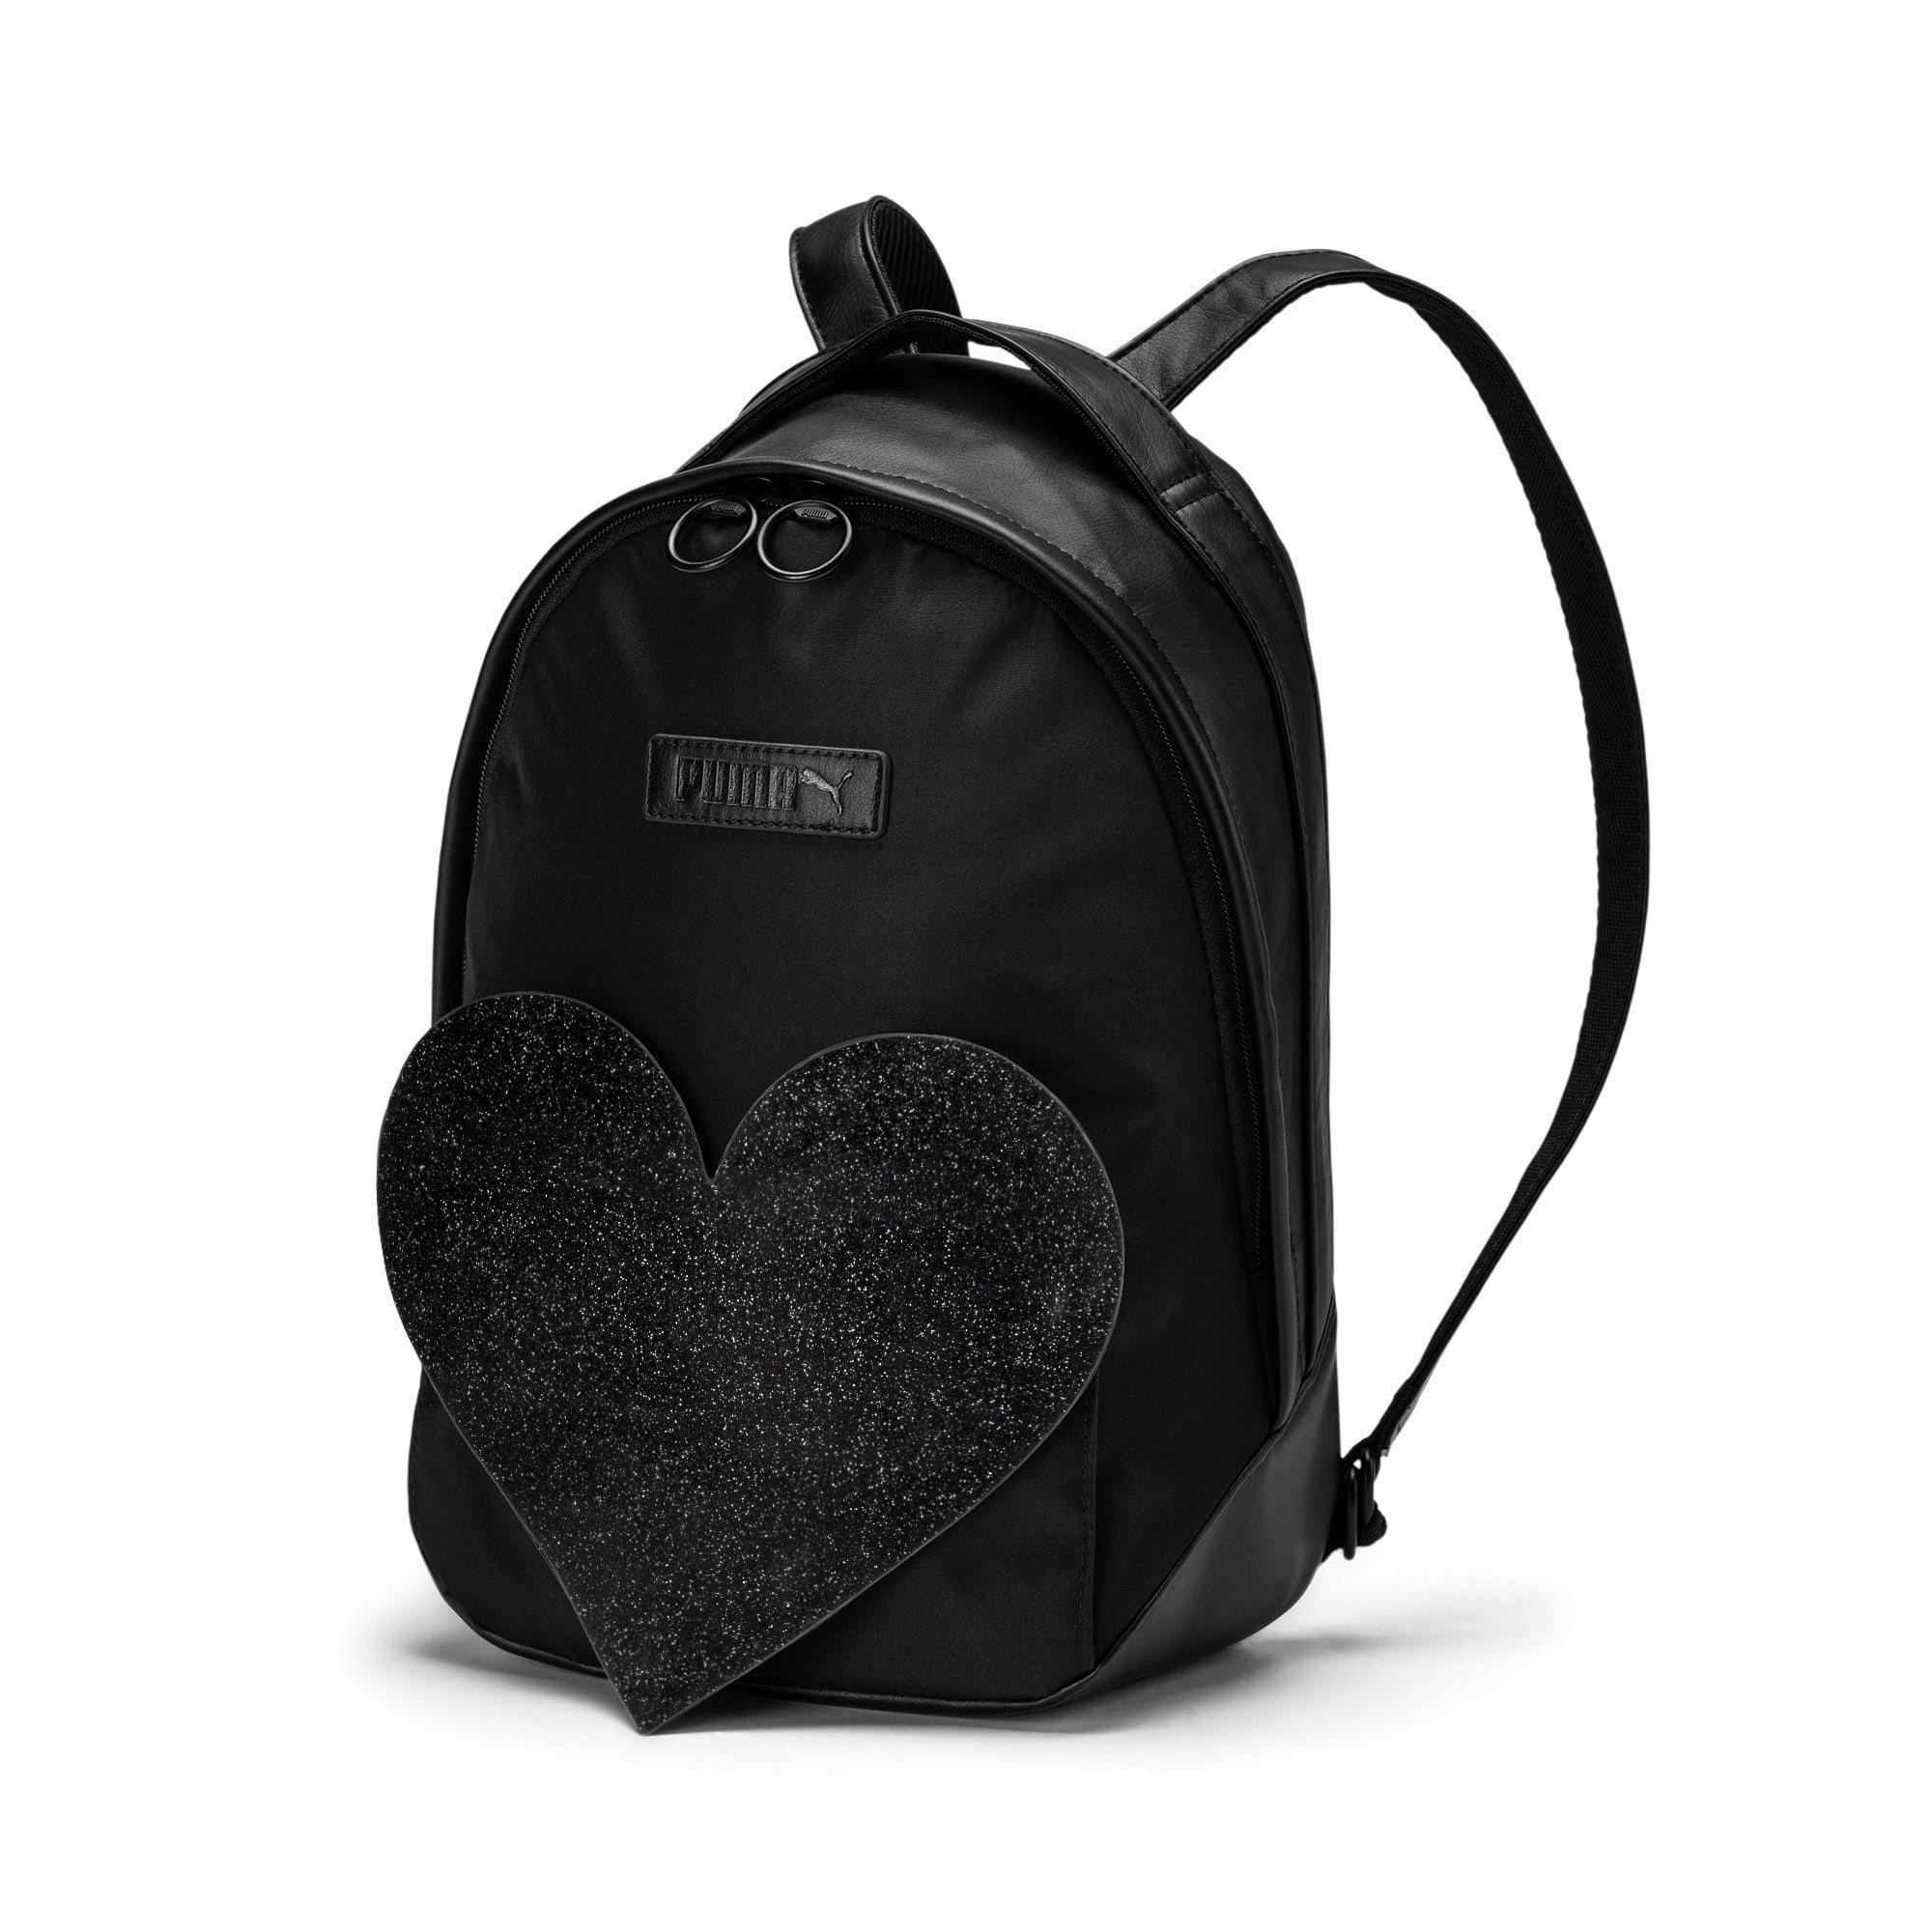 Thumbnail 1 of Prime Archive Valentine Backpack, Puma Black, medium